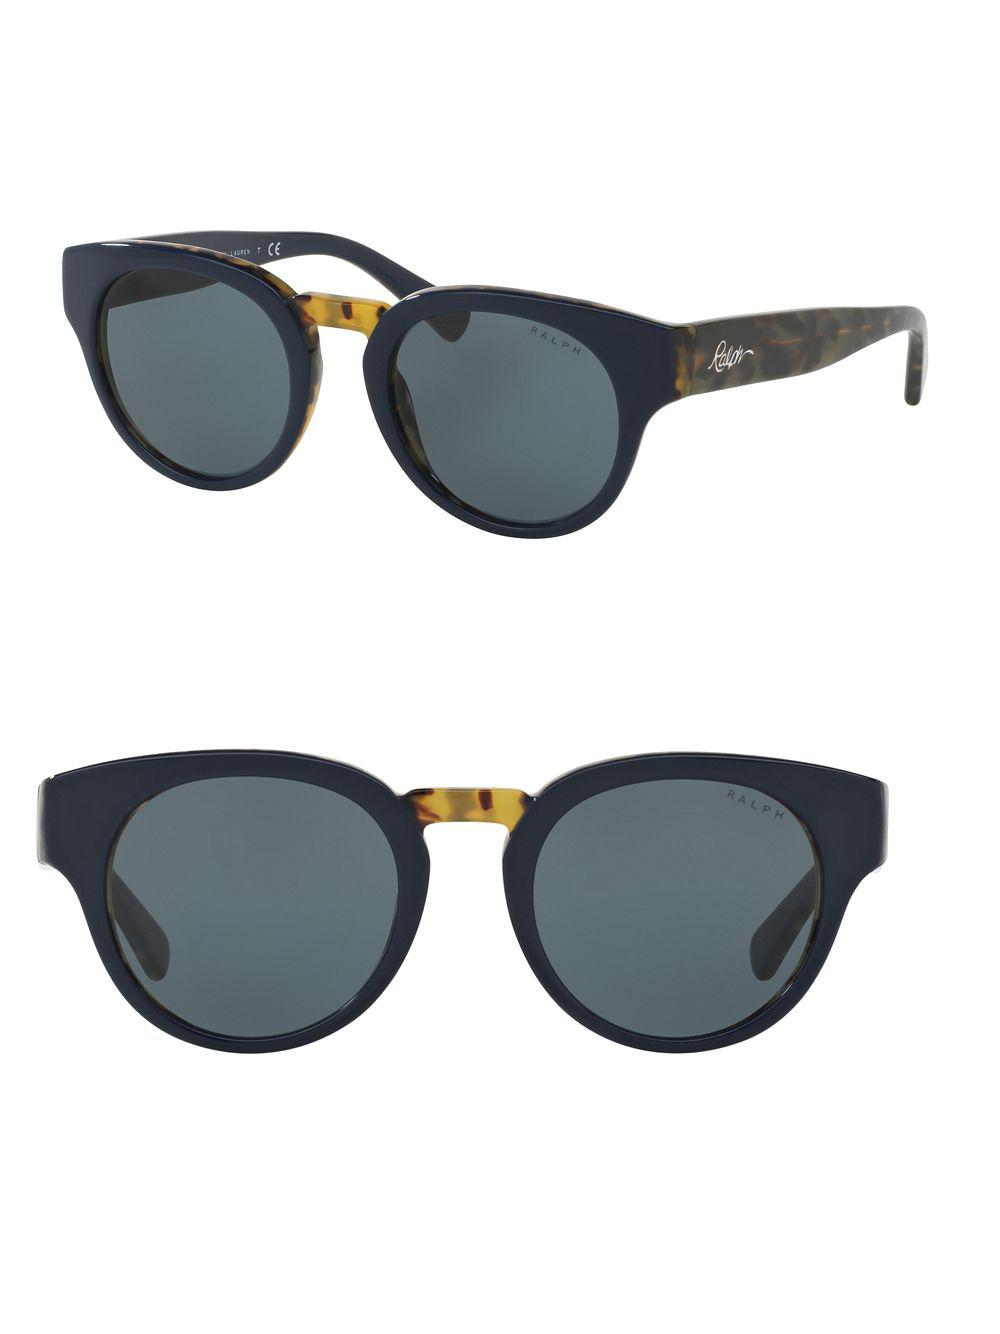 78fd6ae3009 Lyst - Ralph Lauren 50mm Round Sunglasses in Blue